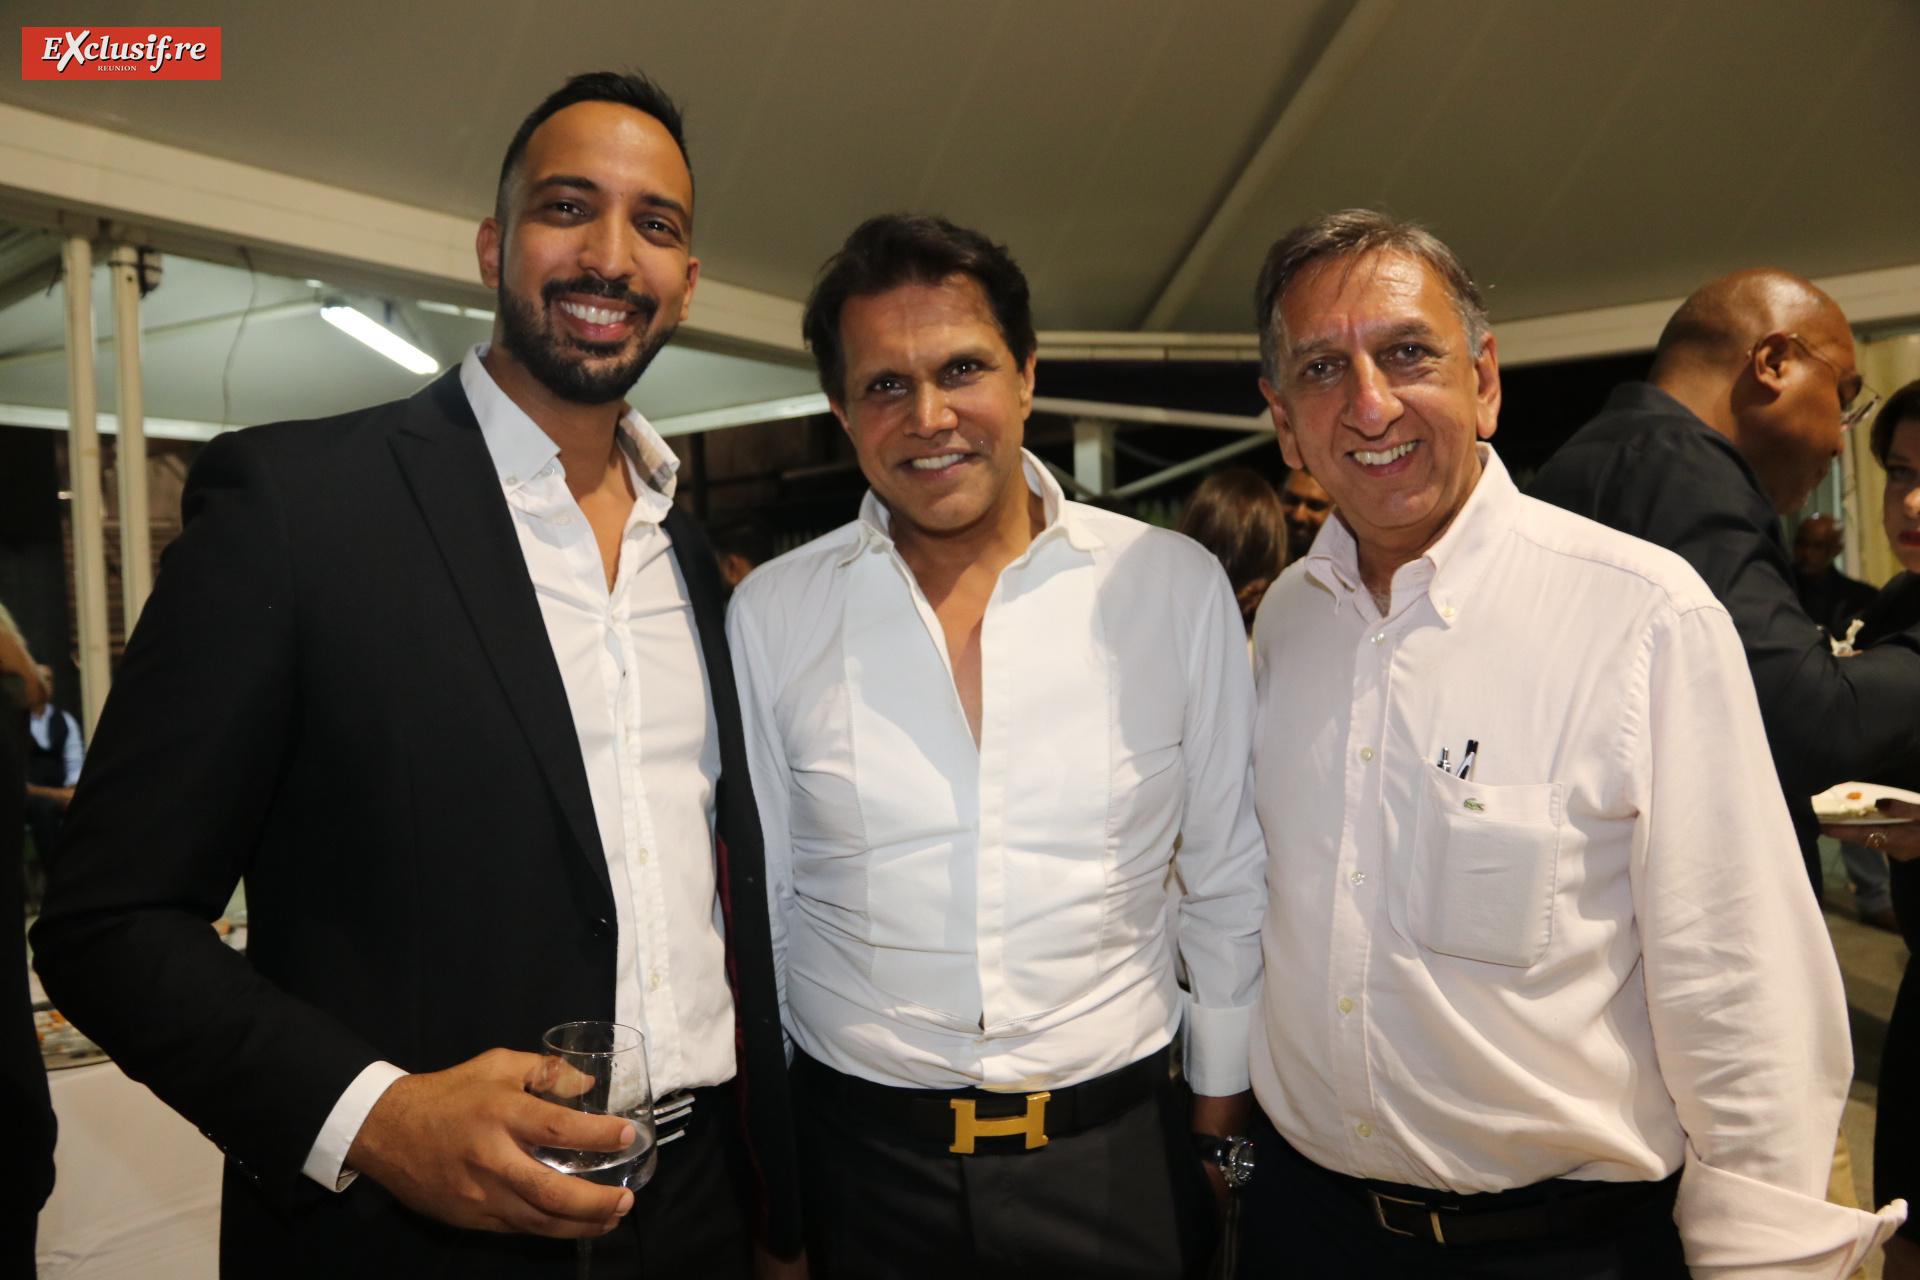 Ryad Bentami, Farouk Mangrolia, directeur des ventes Volvo et Lexus, et Aziz Patel d'Exclusif Réunion